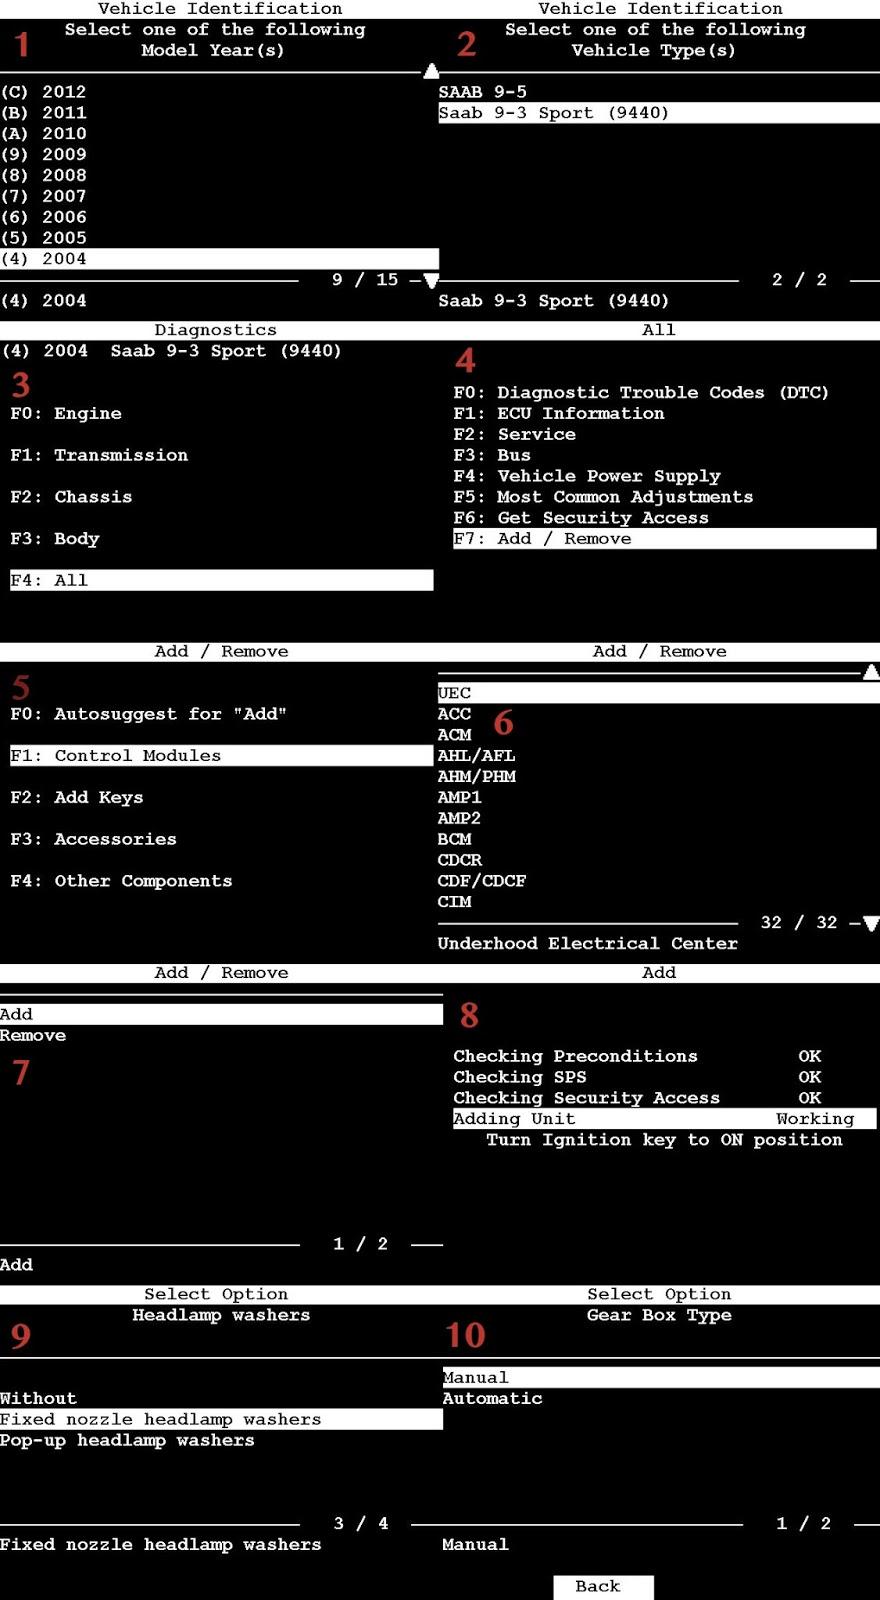 gm-teh2-drl-program-1